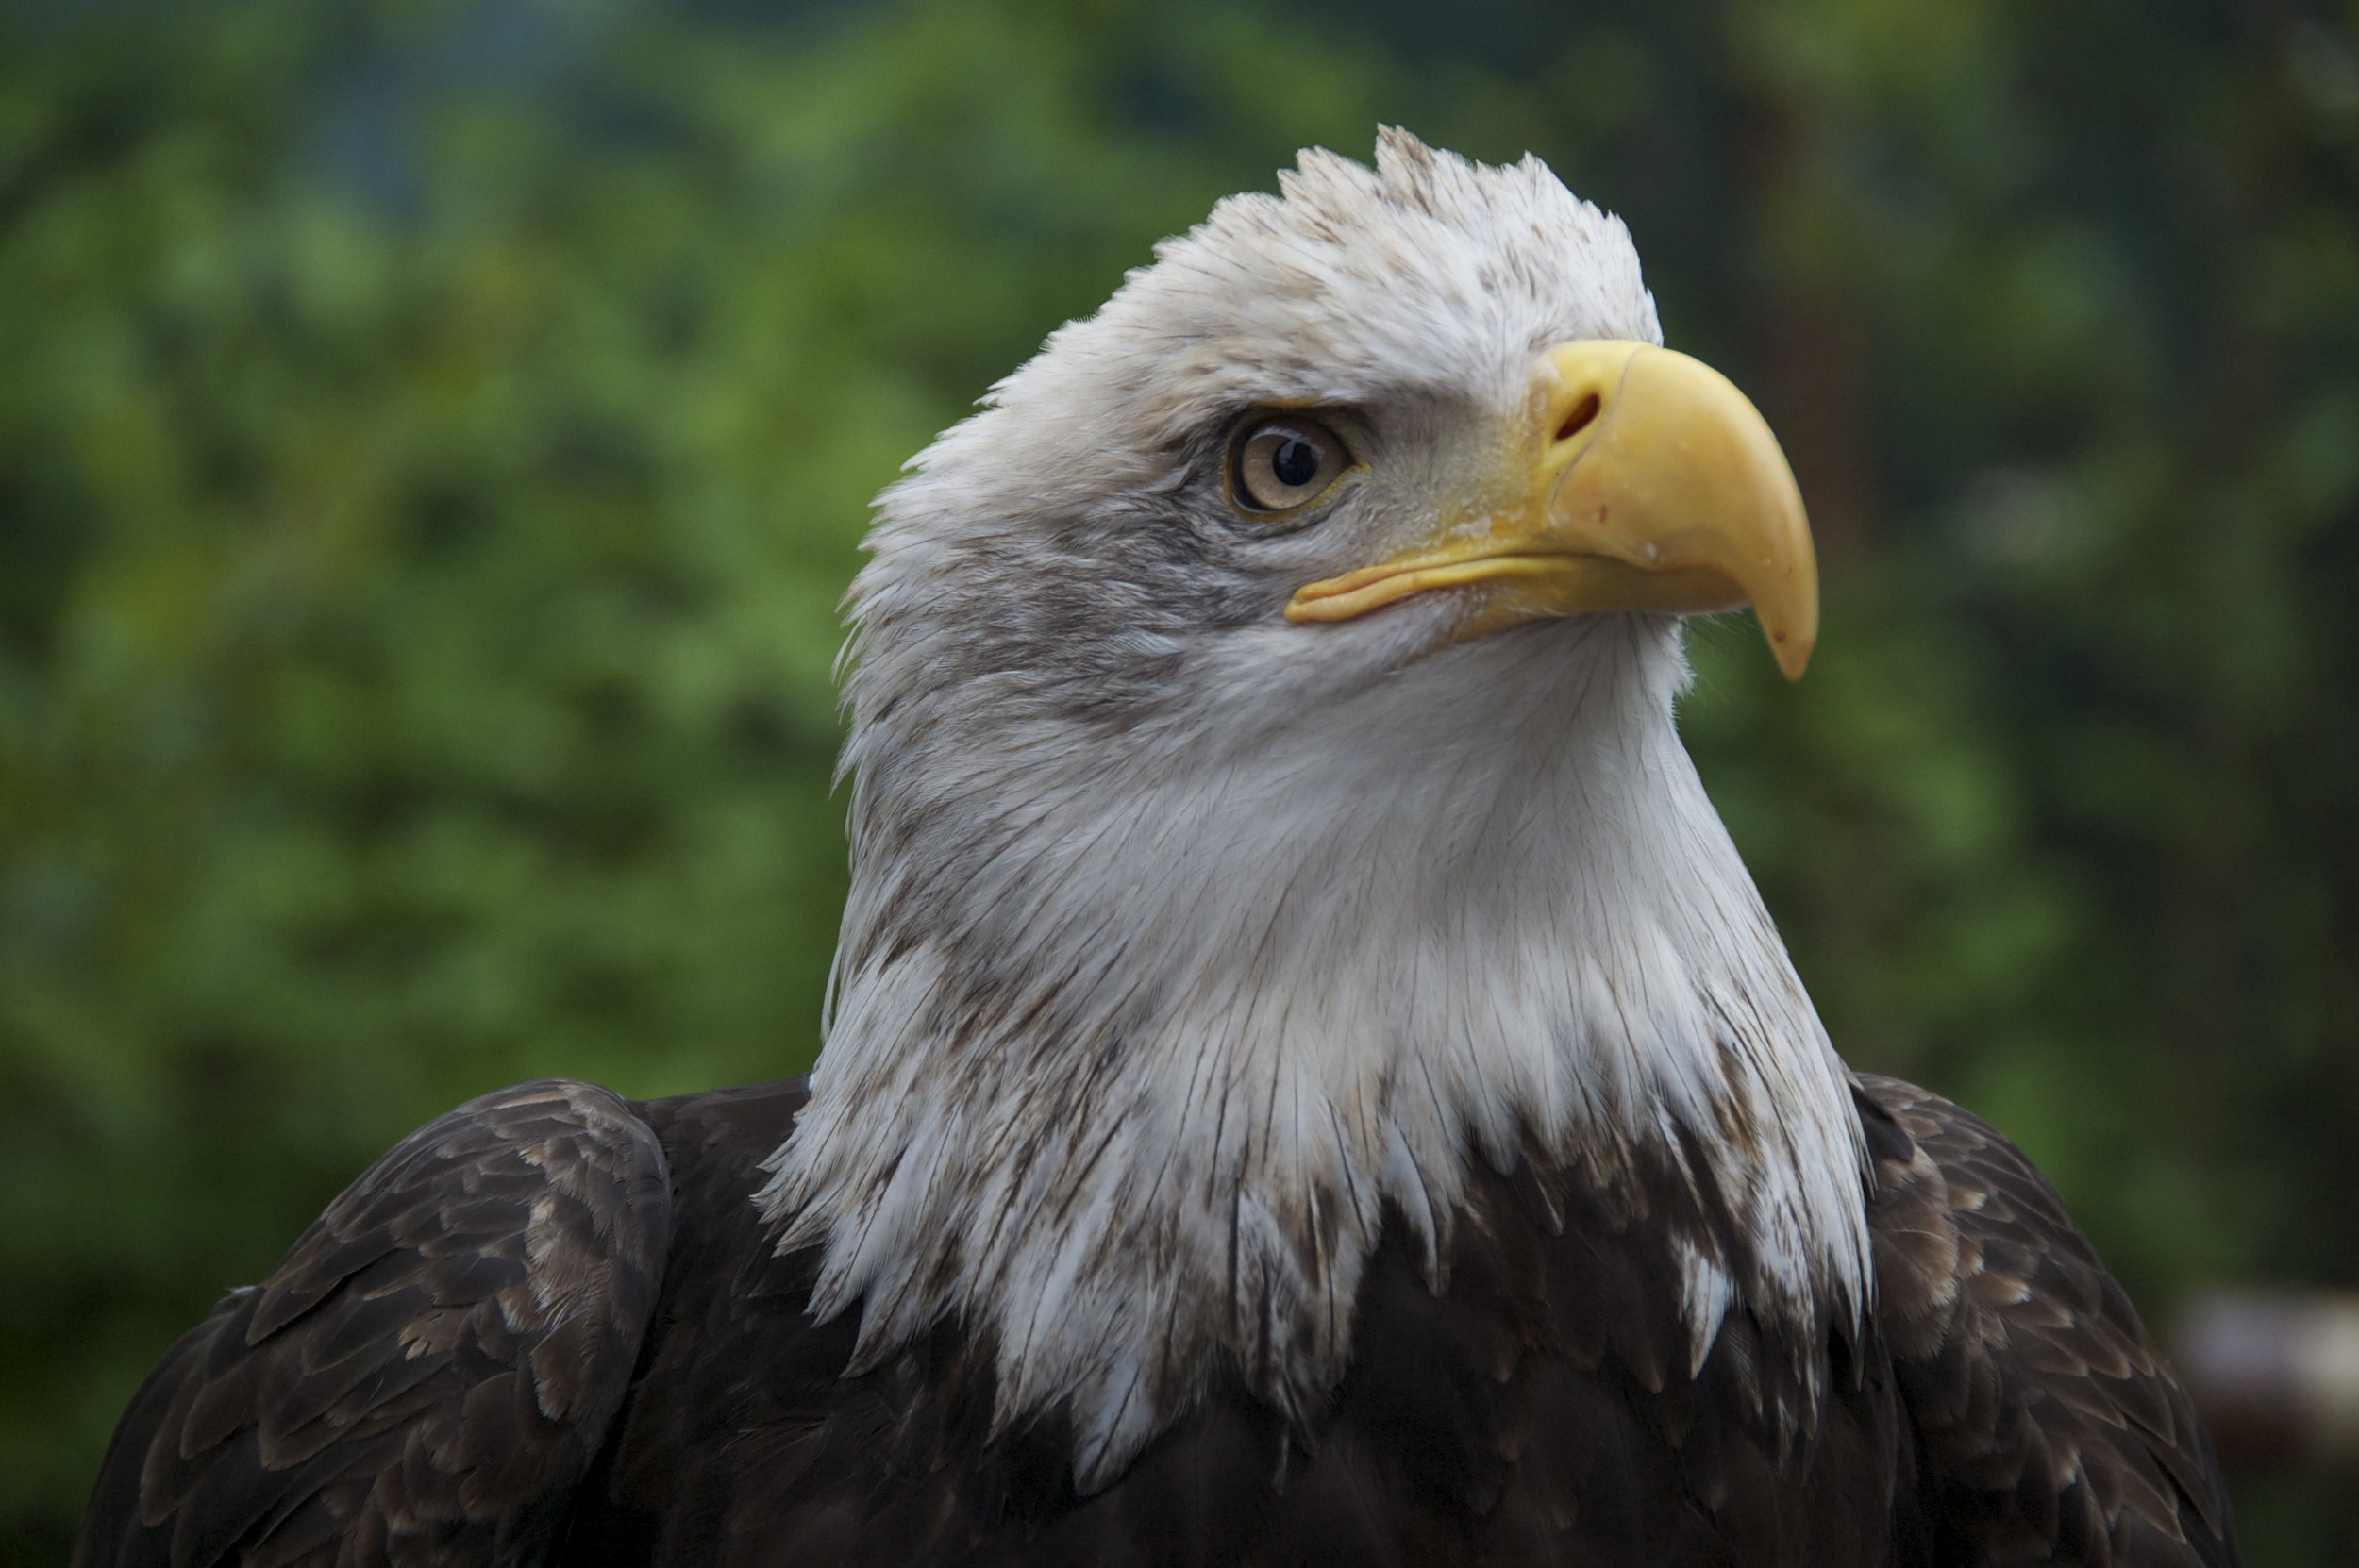 ScottVomvolakis_VomvoVisionz__eagle2.jpg